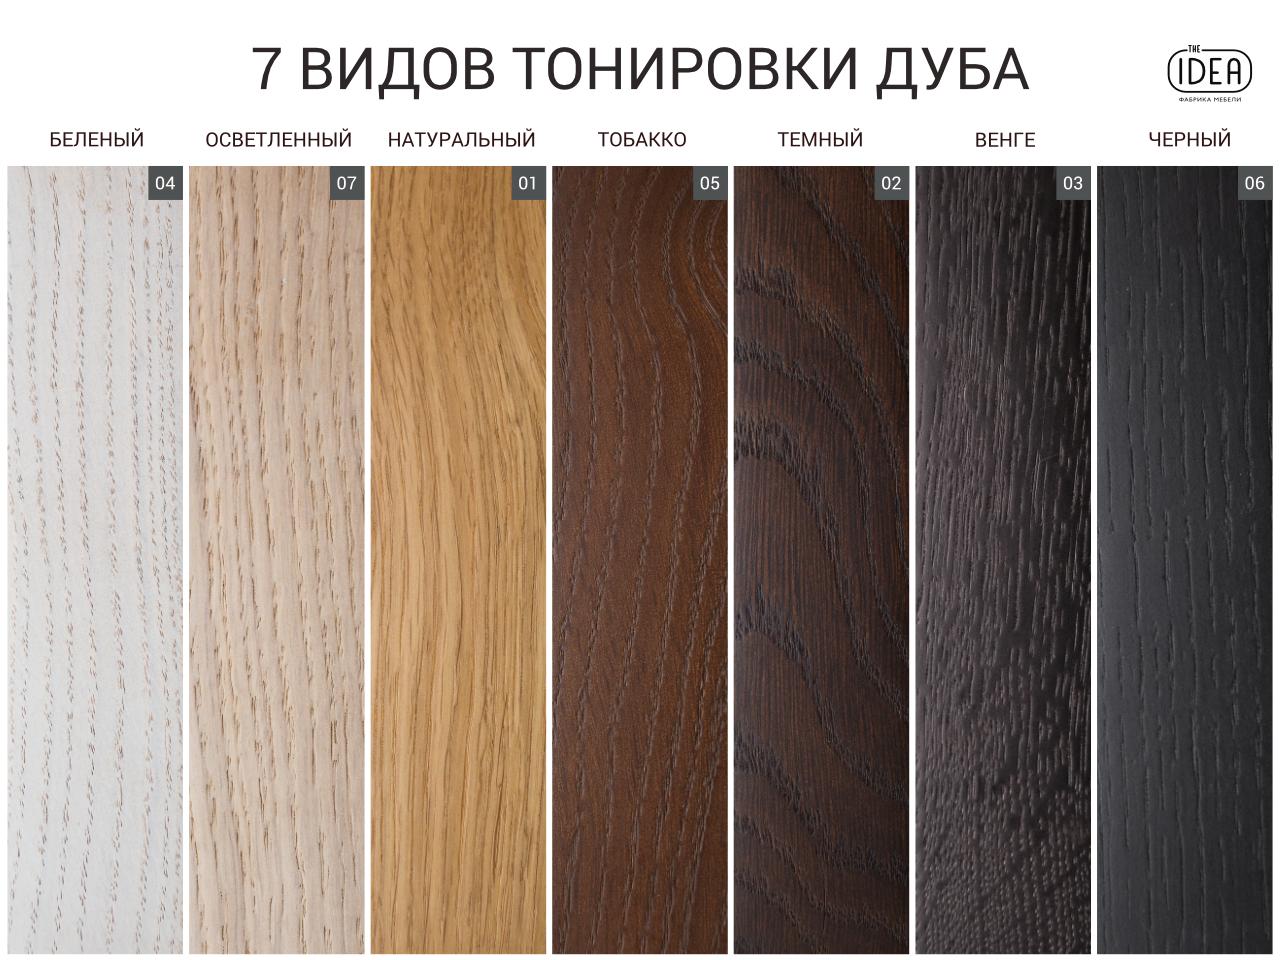 Комод Case №1 серого цвета inmyroom